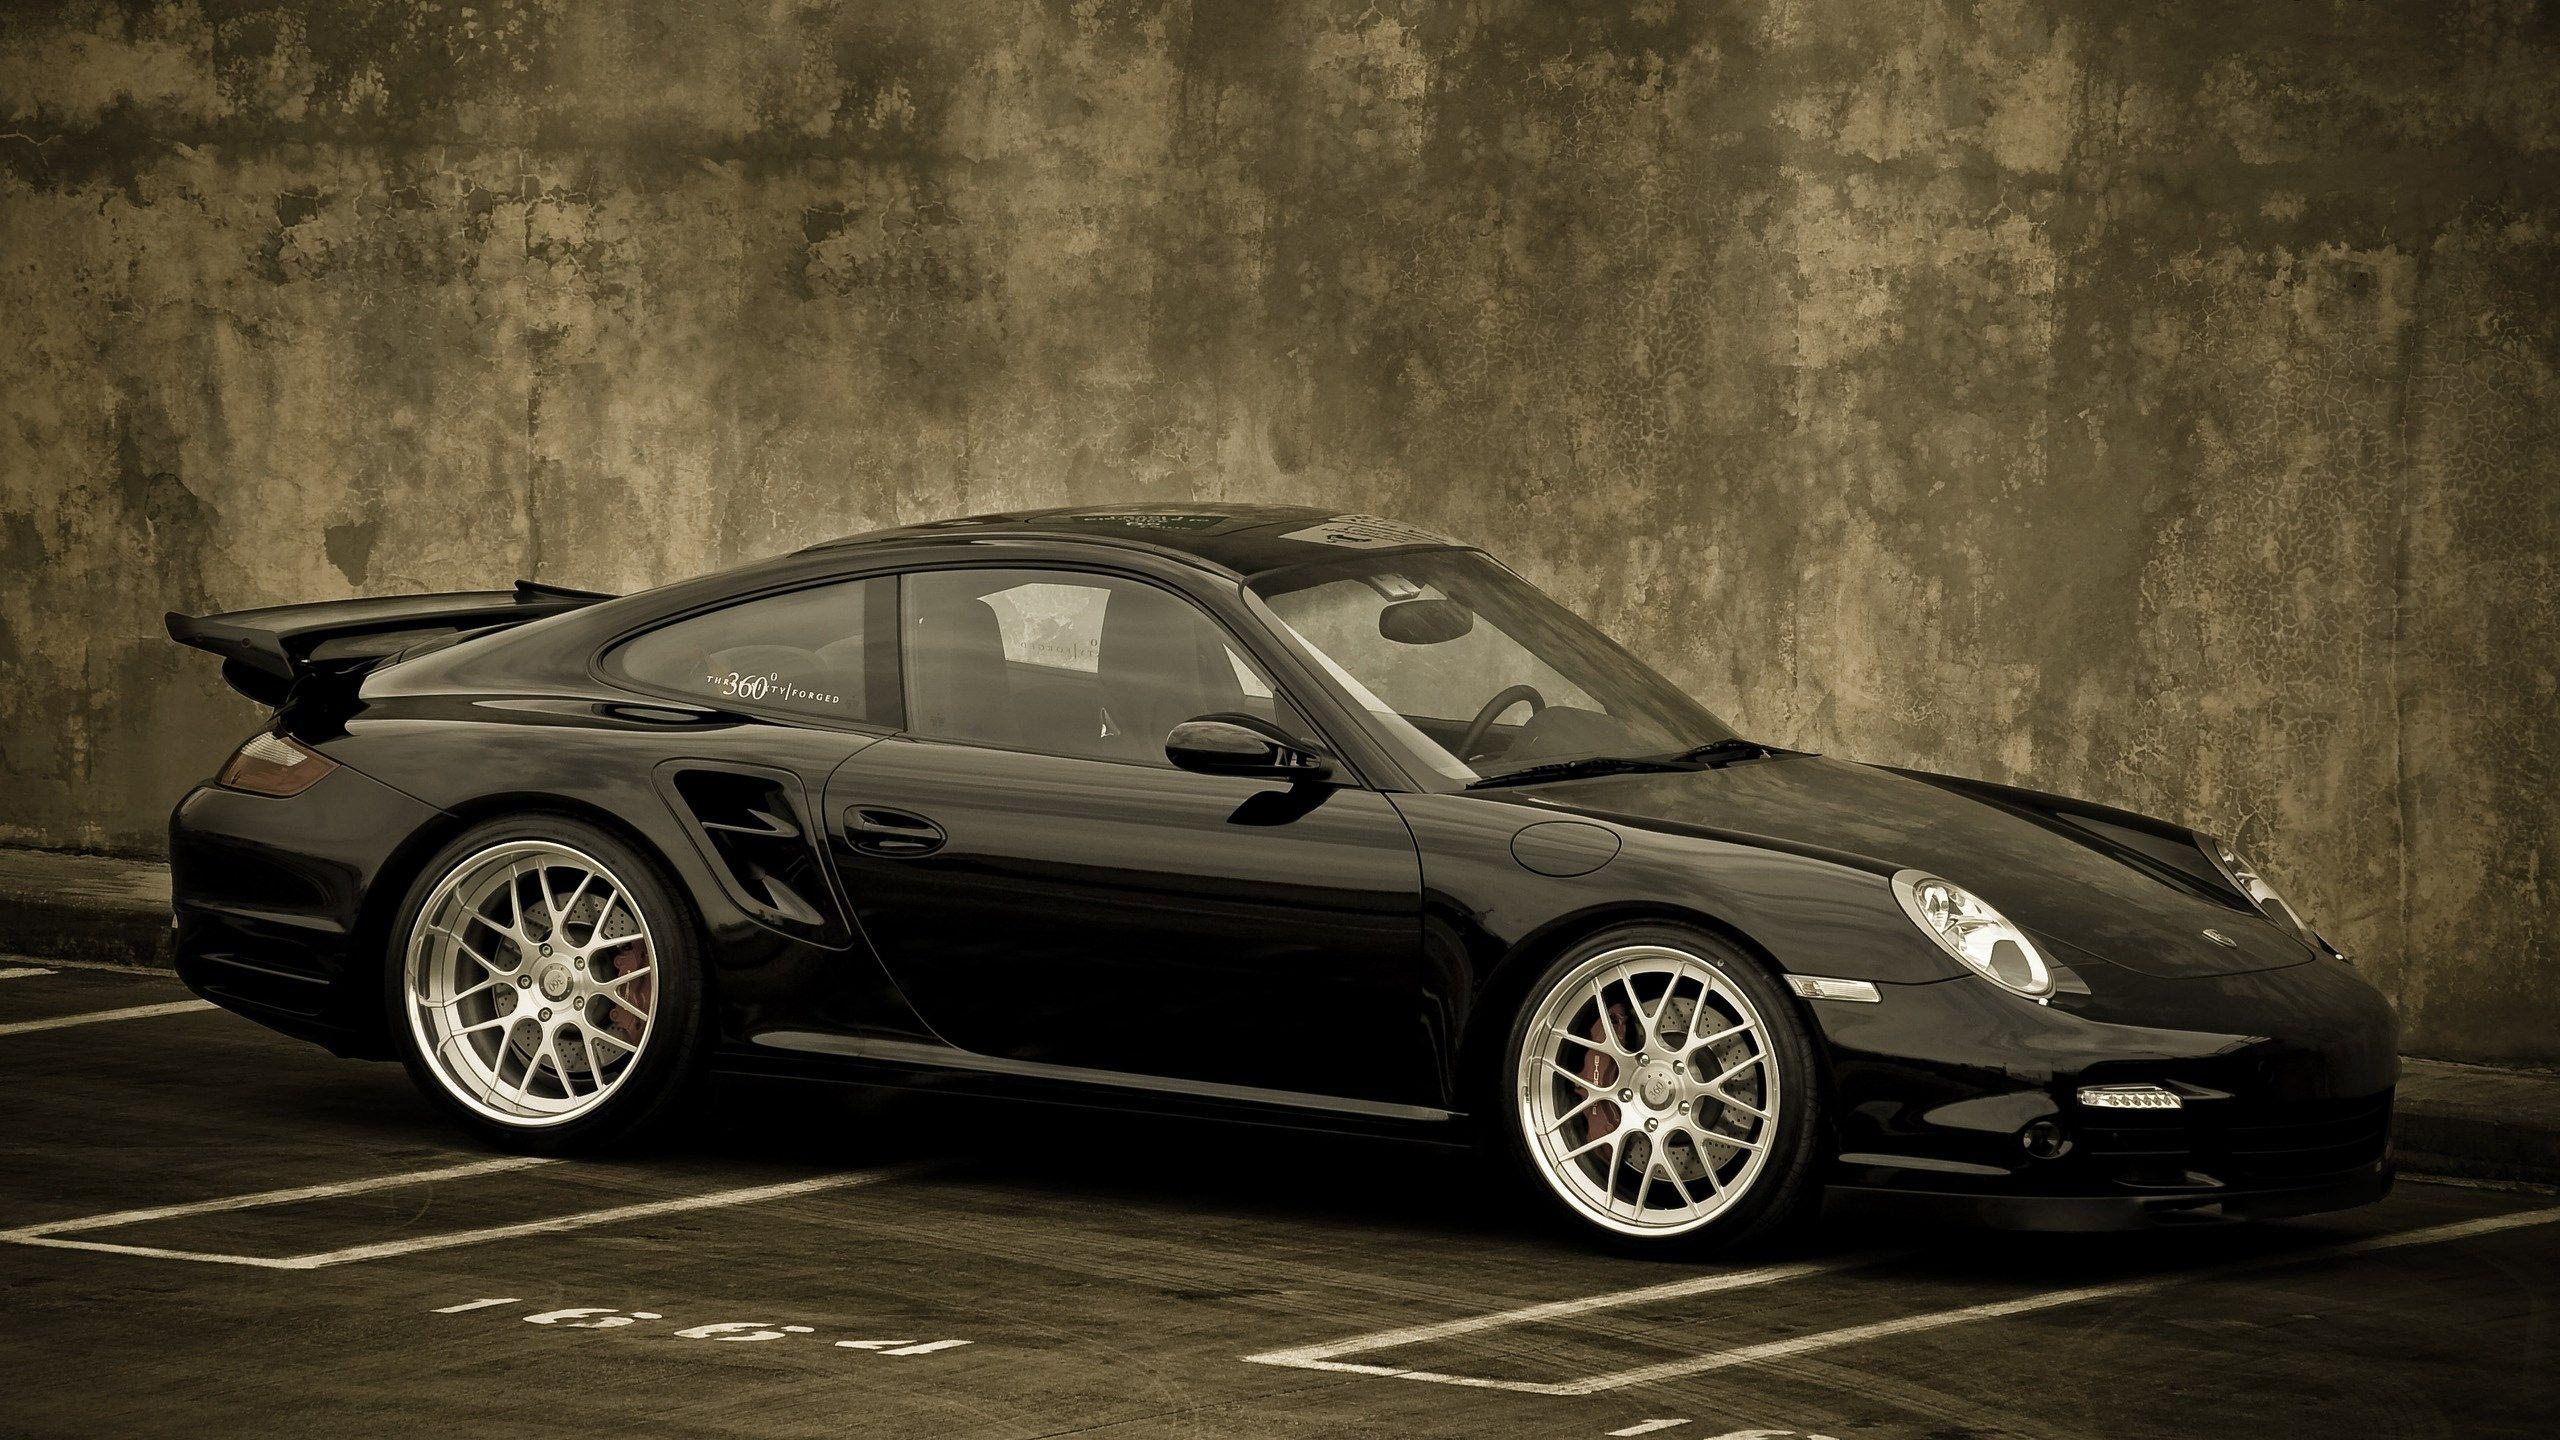 Free Download Porsche Porsche Suv Black Car Wallpaper Black Porsche